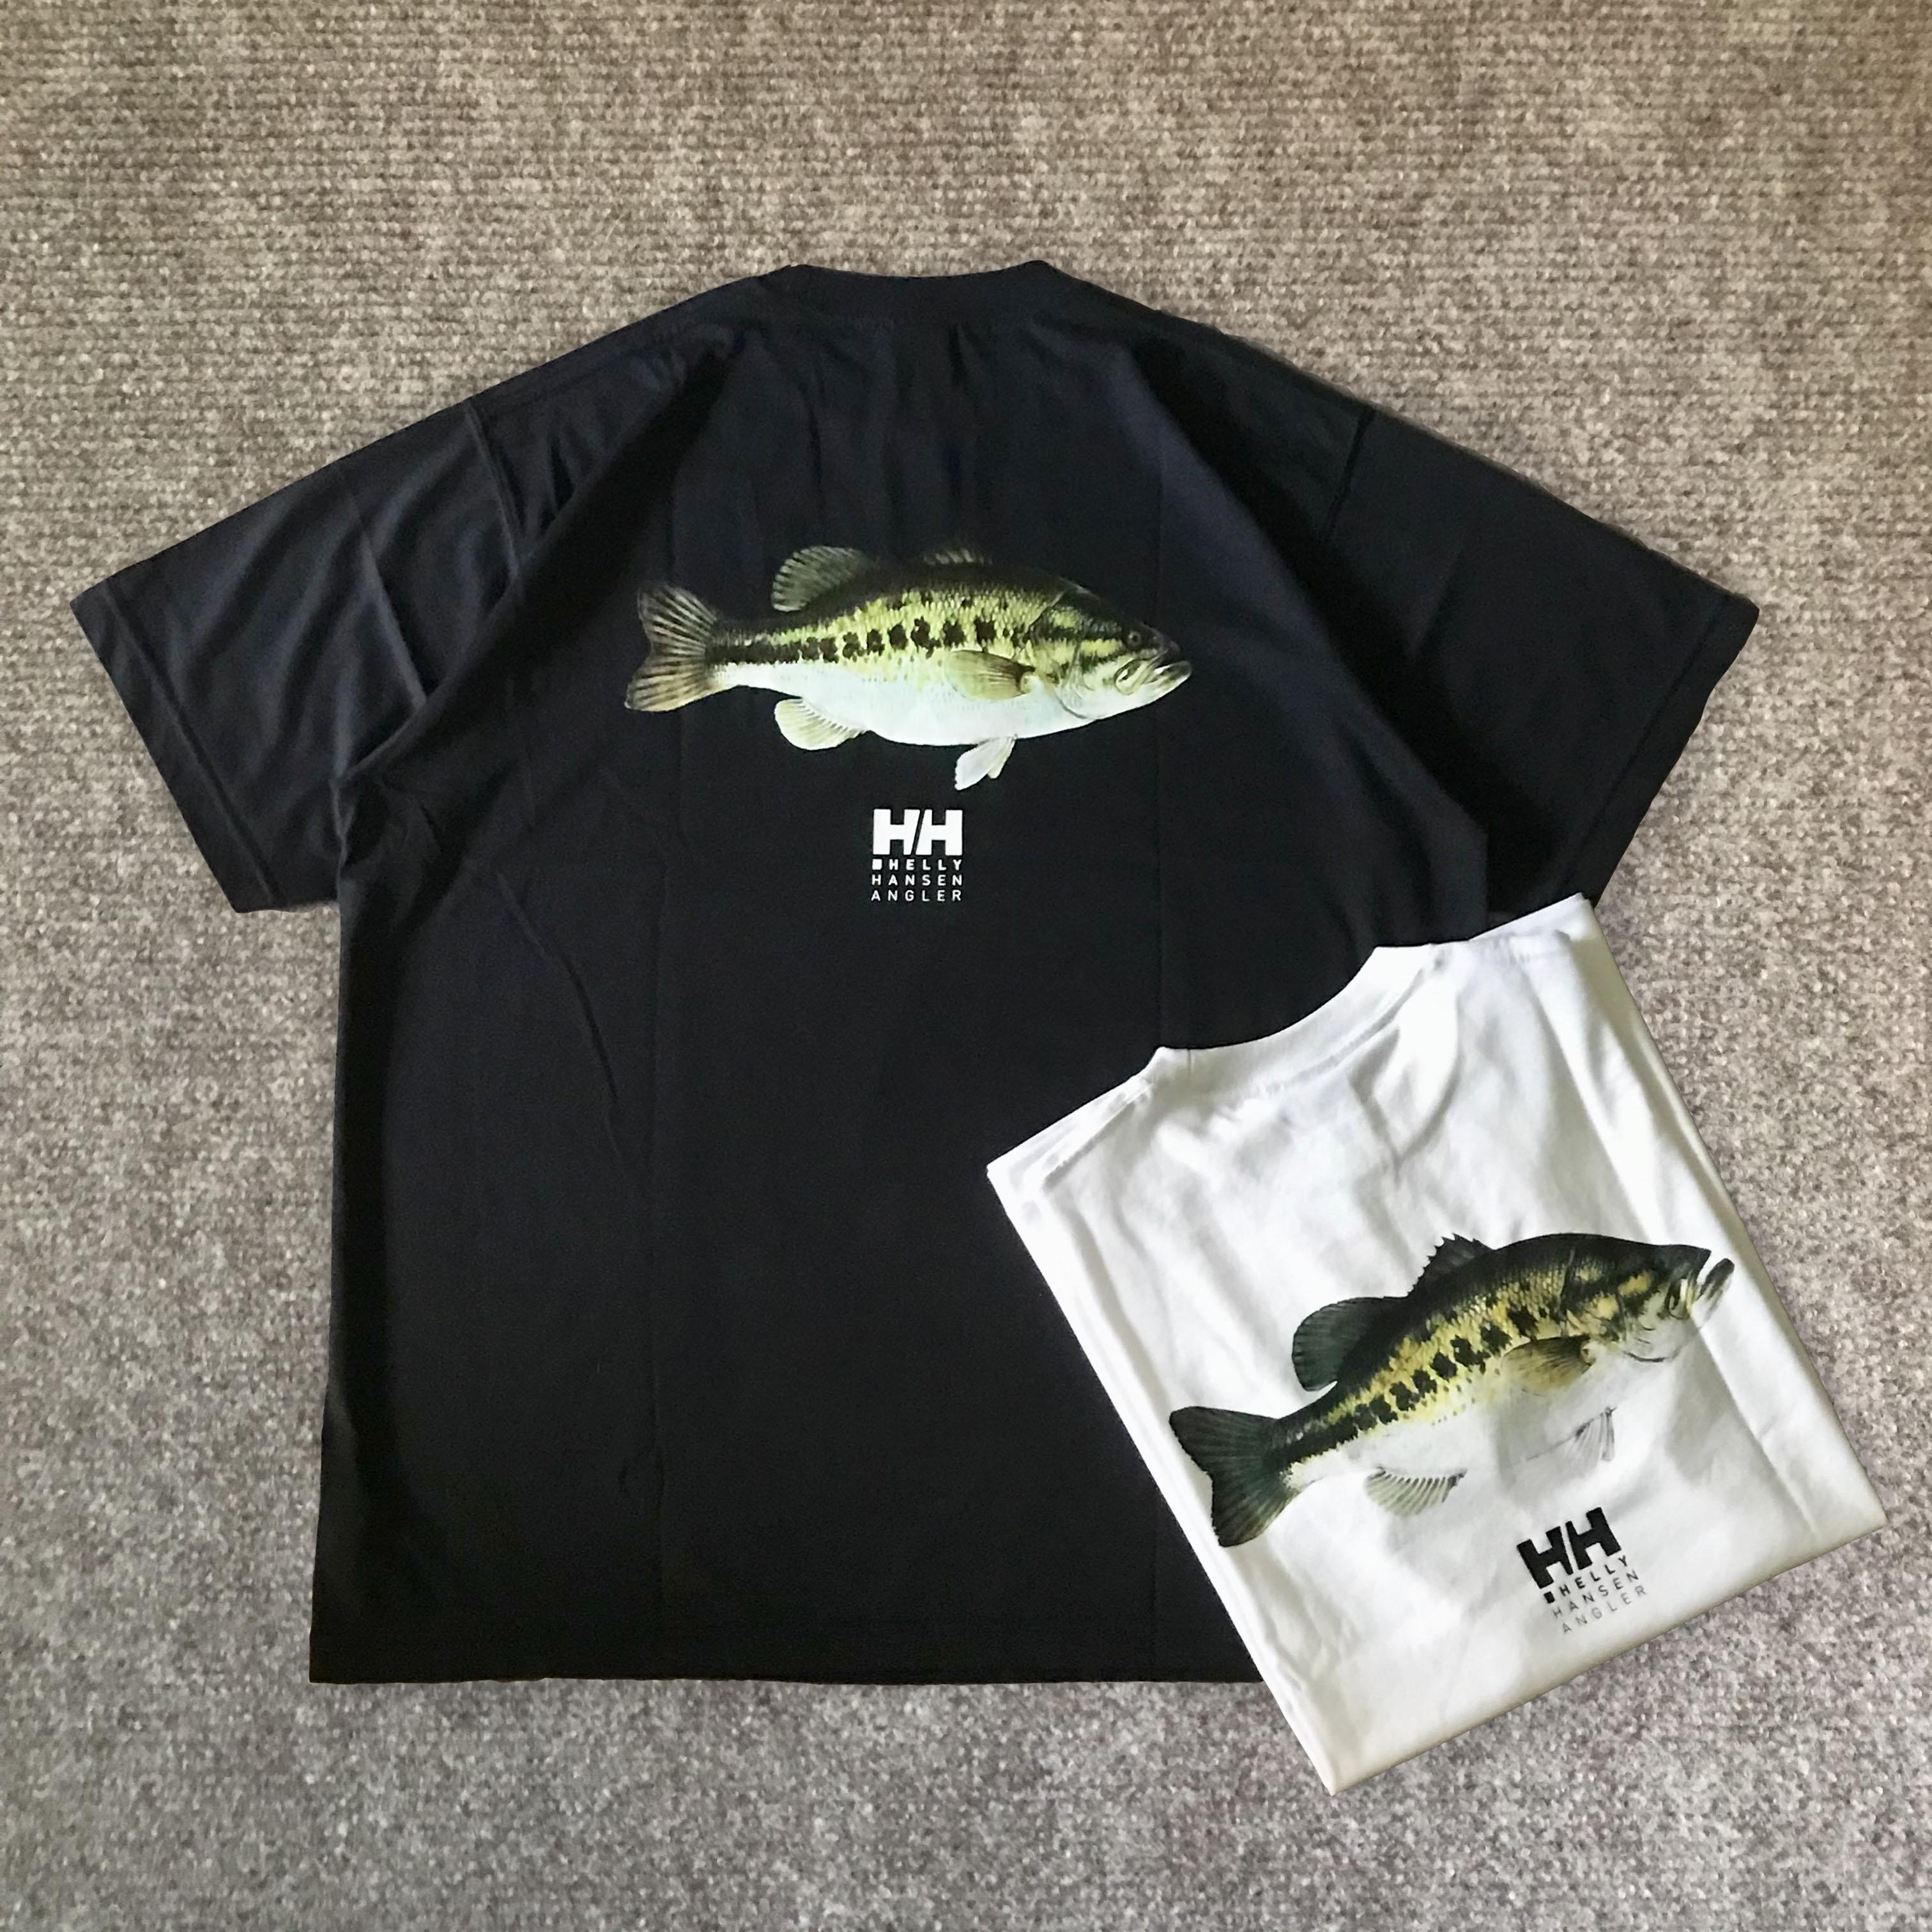 【现货】BEAMS 20ss HELLY HANSEN HH联名限定 Angler T 短袖T恤